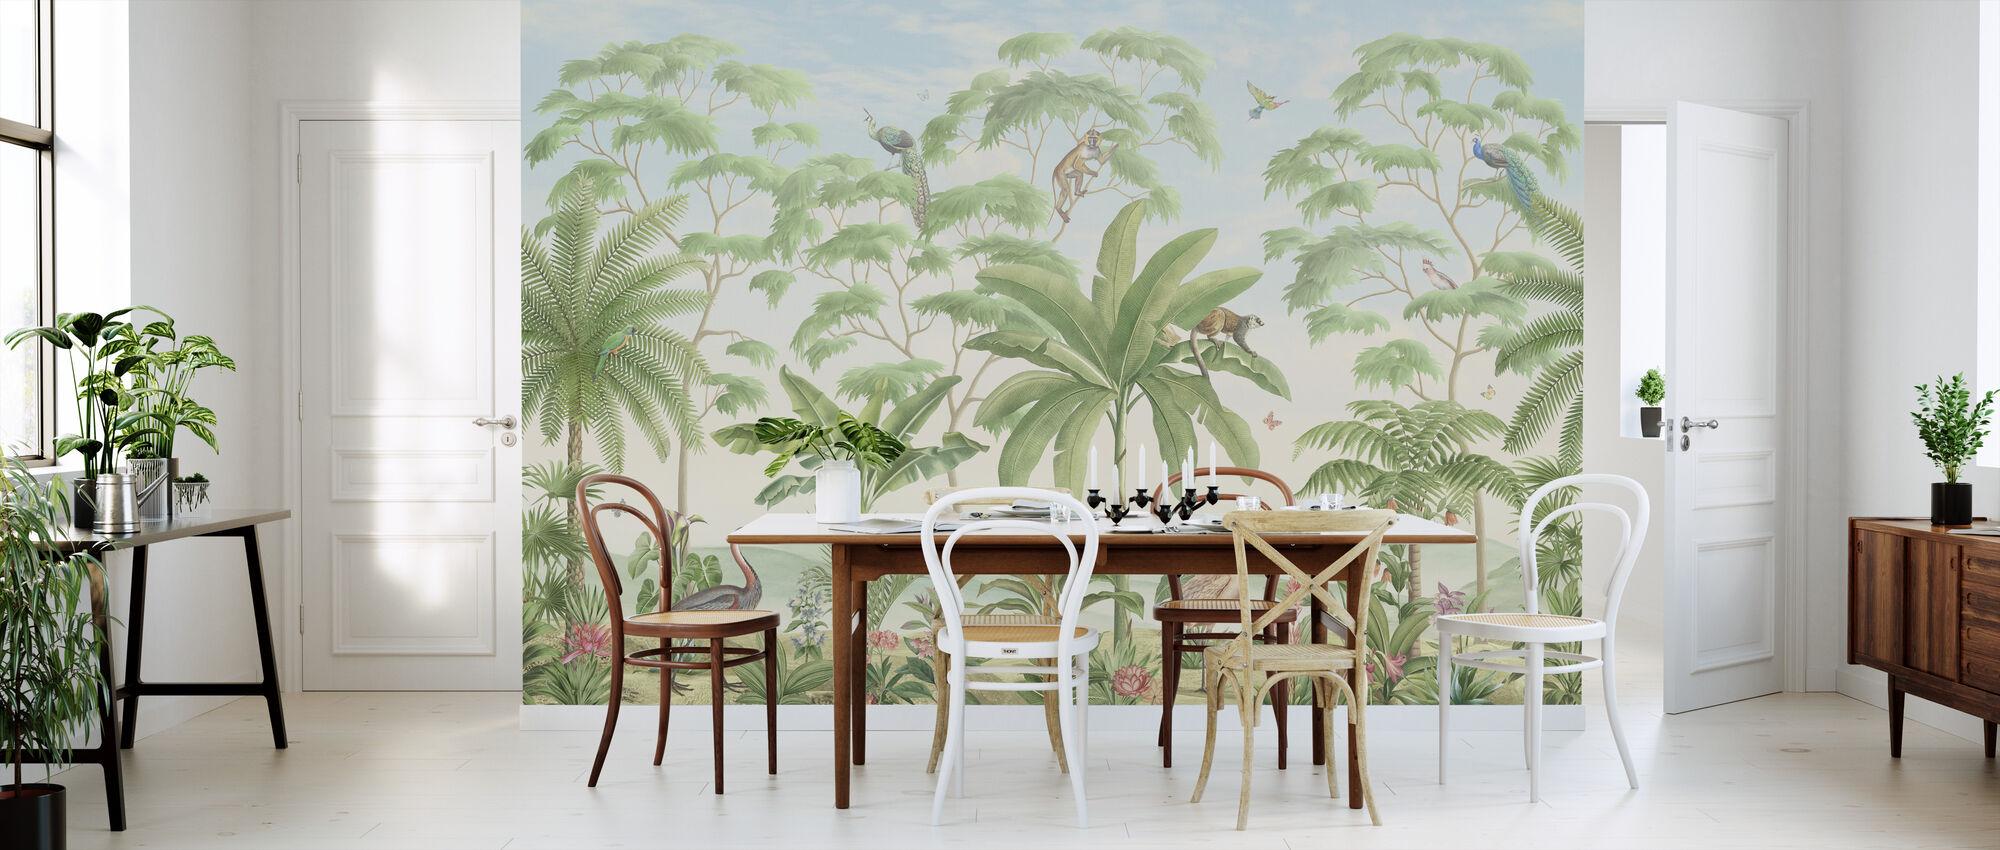 Tropical Eden - Wallpaper - Kitchen